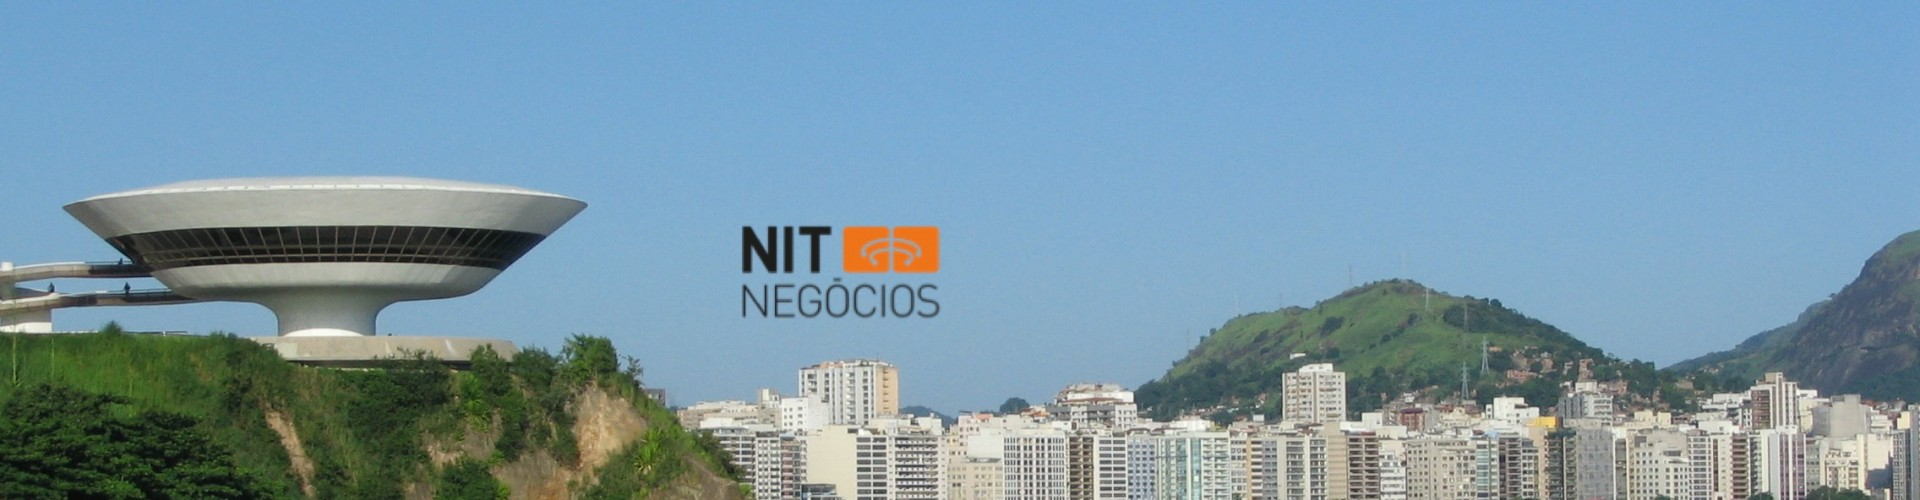 Niterói Negócios